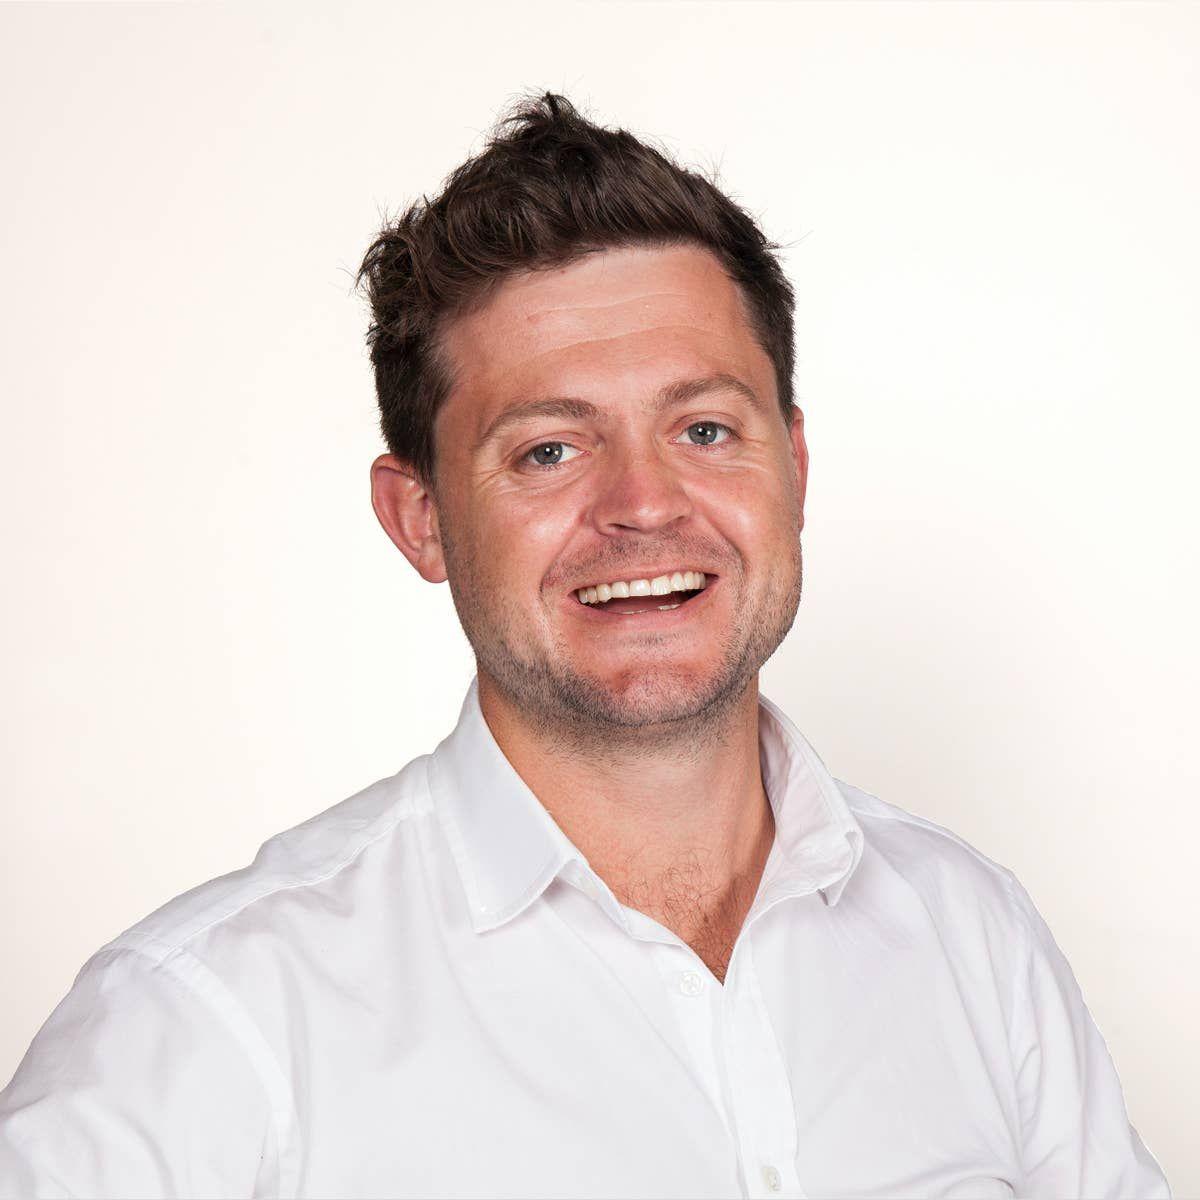 Profile photo of Joe Carter, Global Head of Business Development at Carat